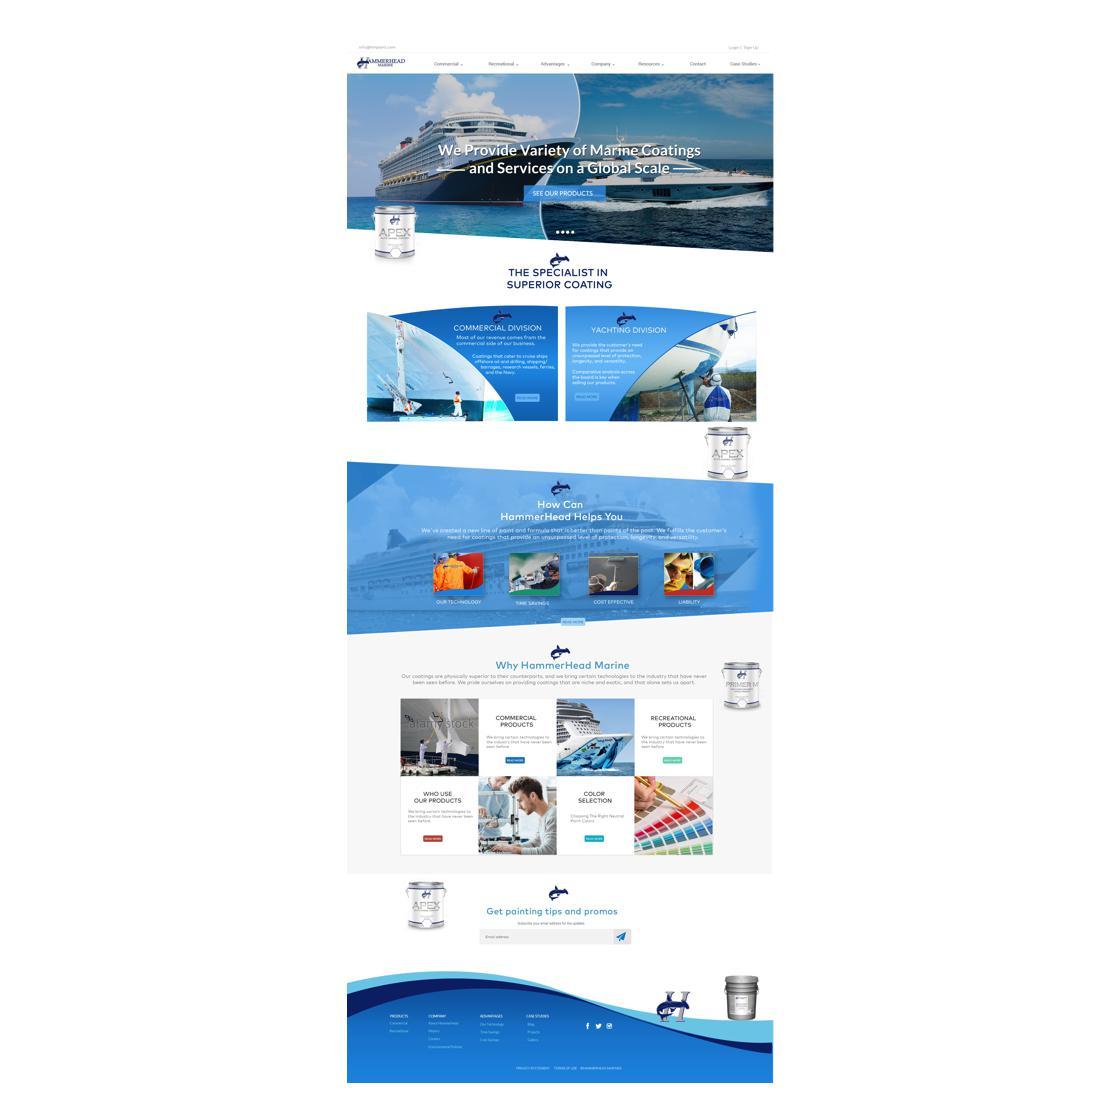 website designed by imrana